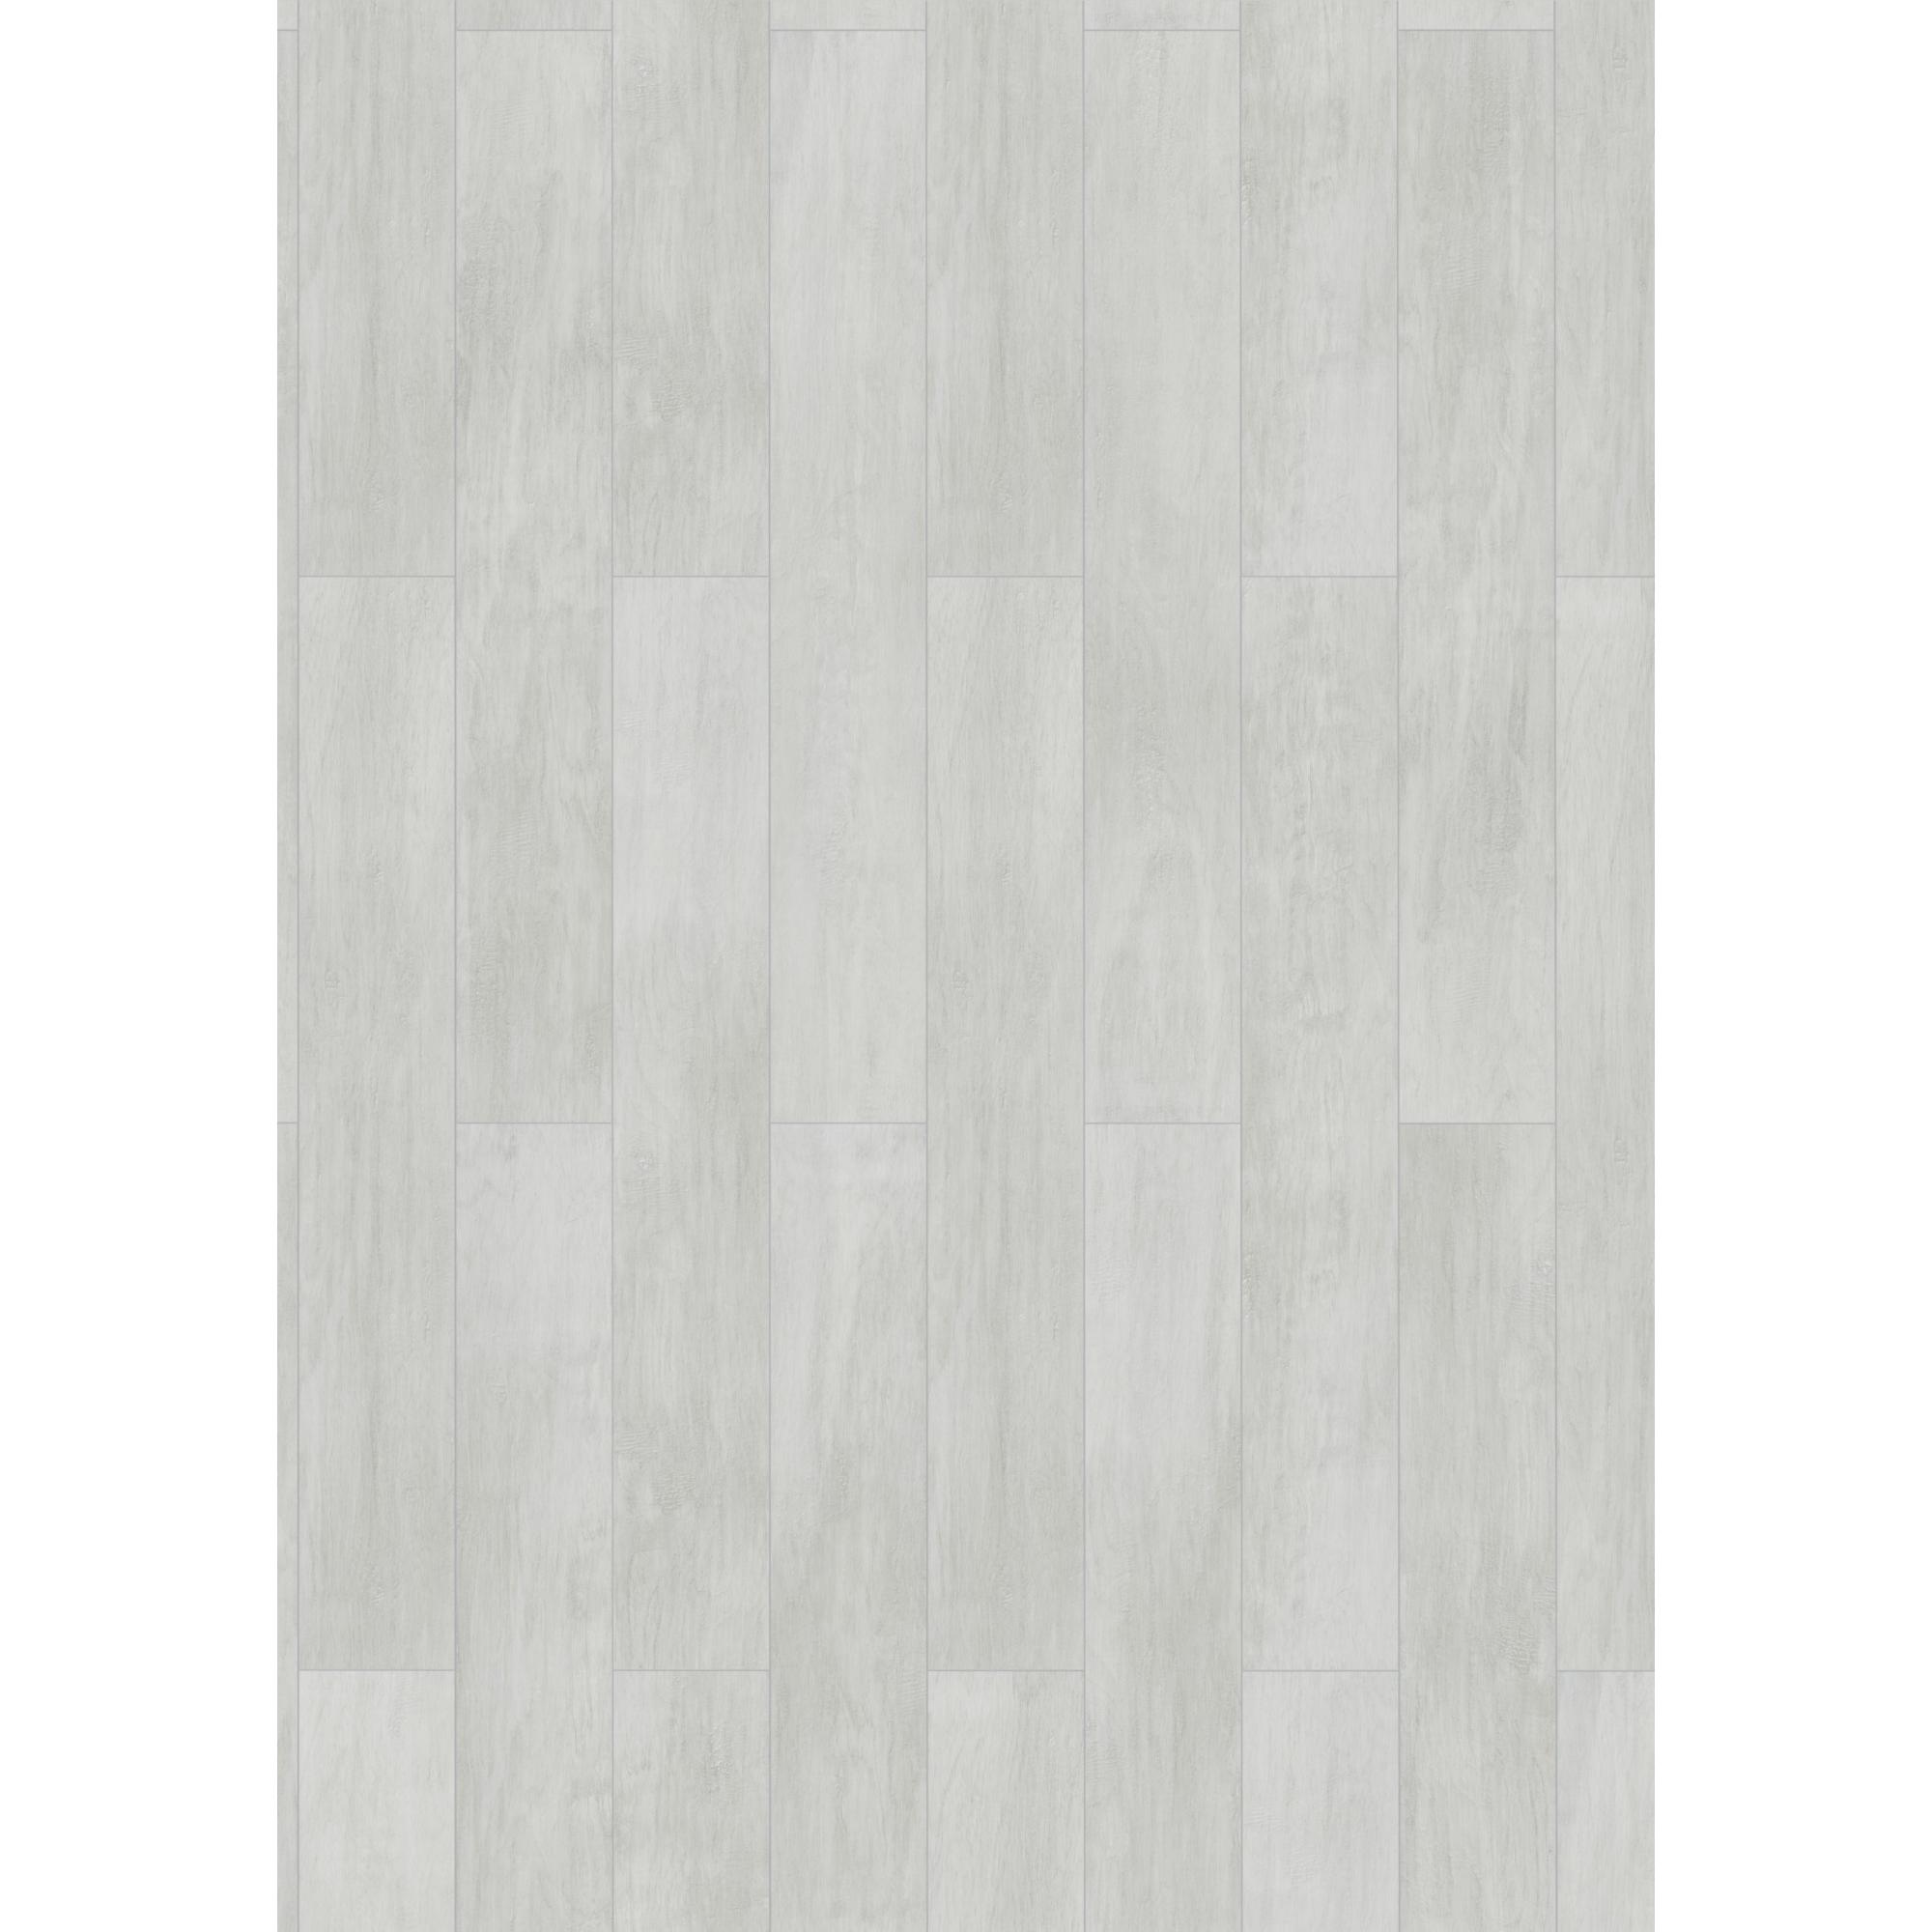 Greenvinyl Pinie Weiß